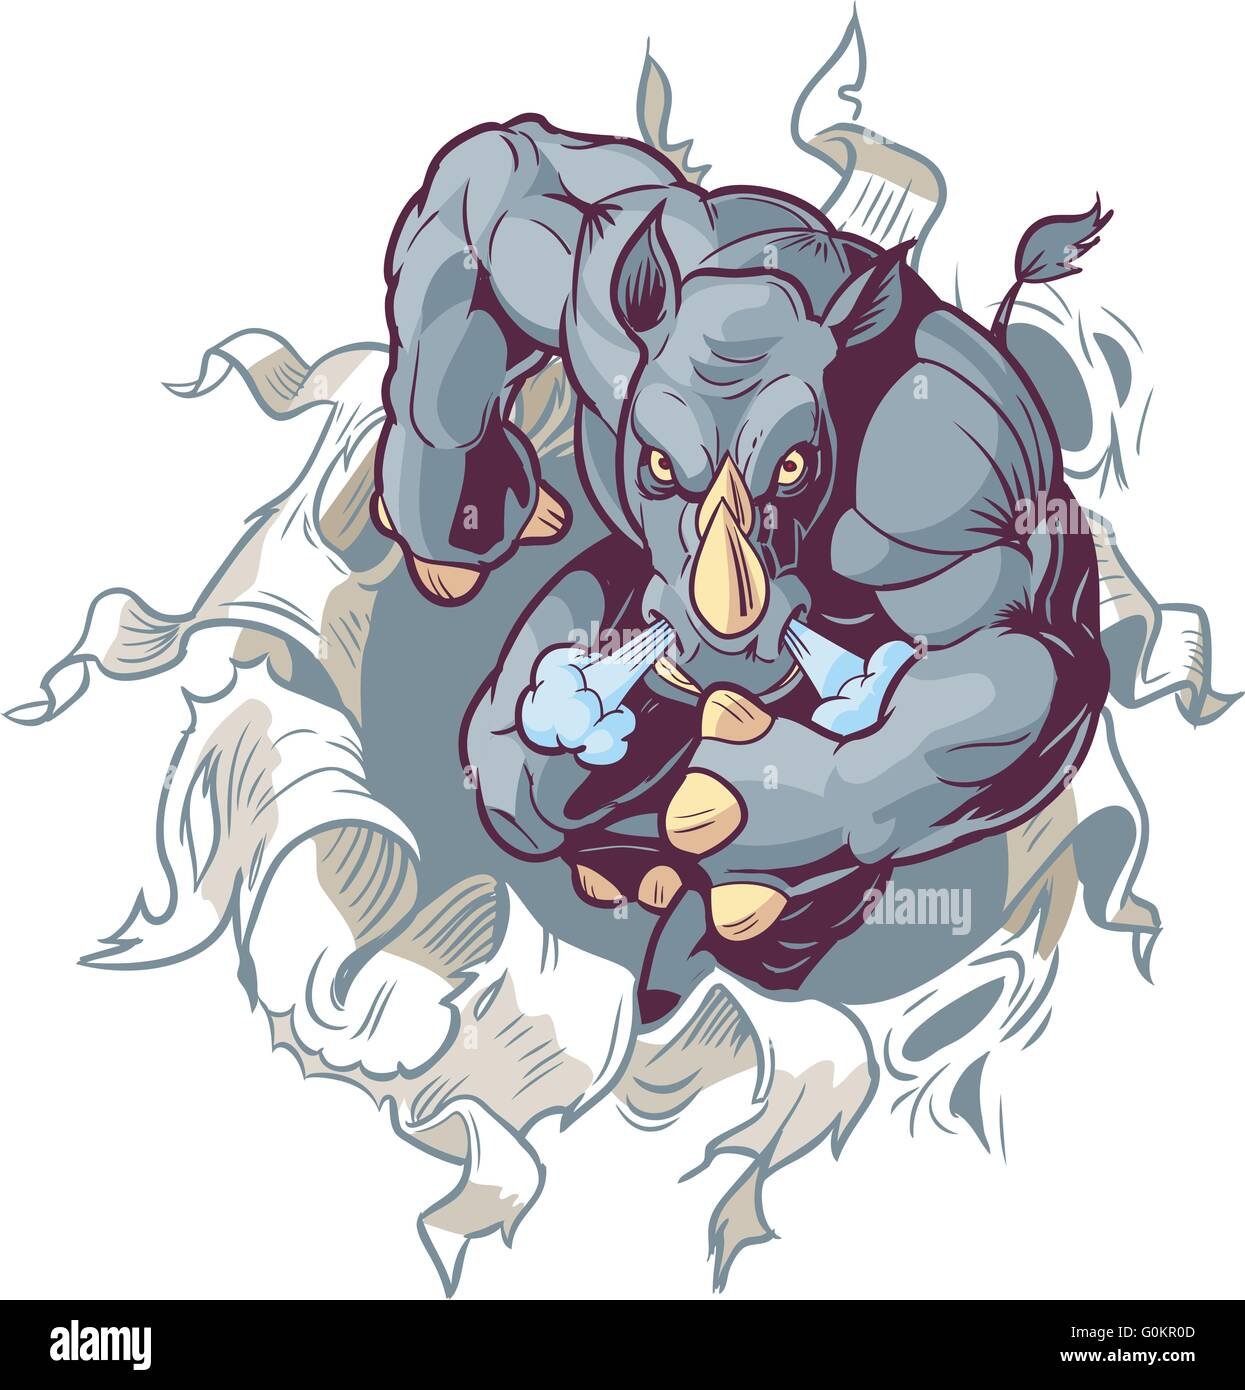 Vector Cartoon Clip Art Illustration of an Anthropomorphic Cartoon Mascot Rhino Ripping Forward Through a Paper - Stock Image